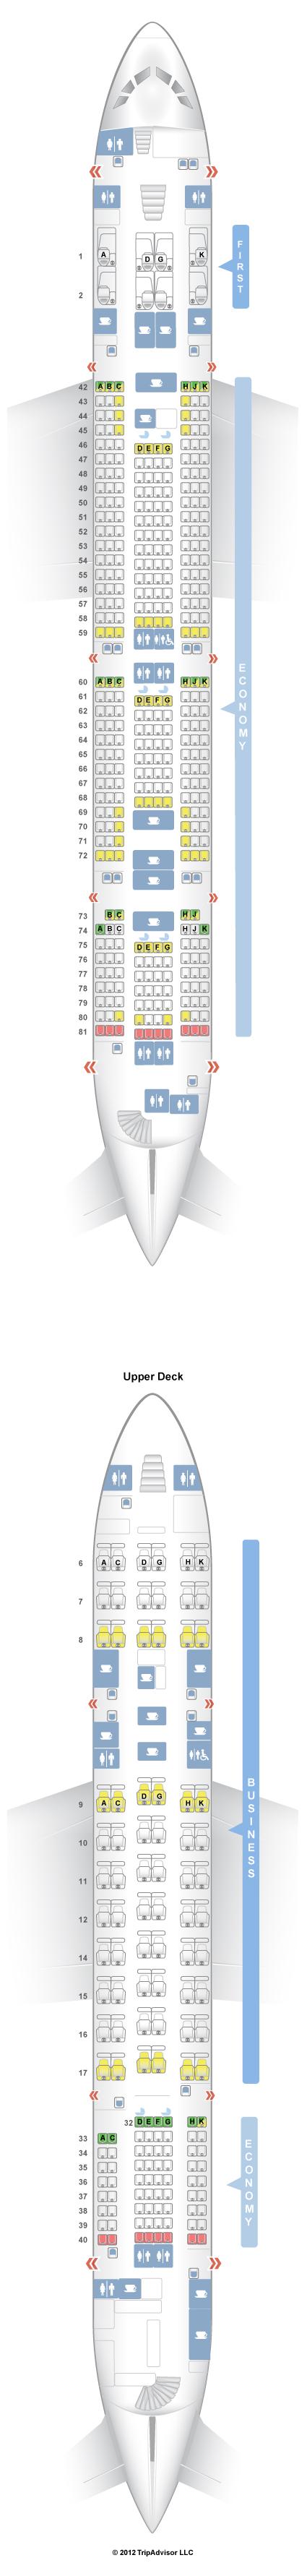 Seatguru Seat Map Malaysia Airlines Airbus A380 800 388